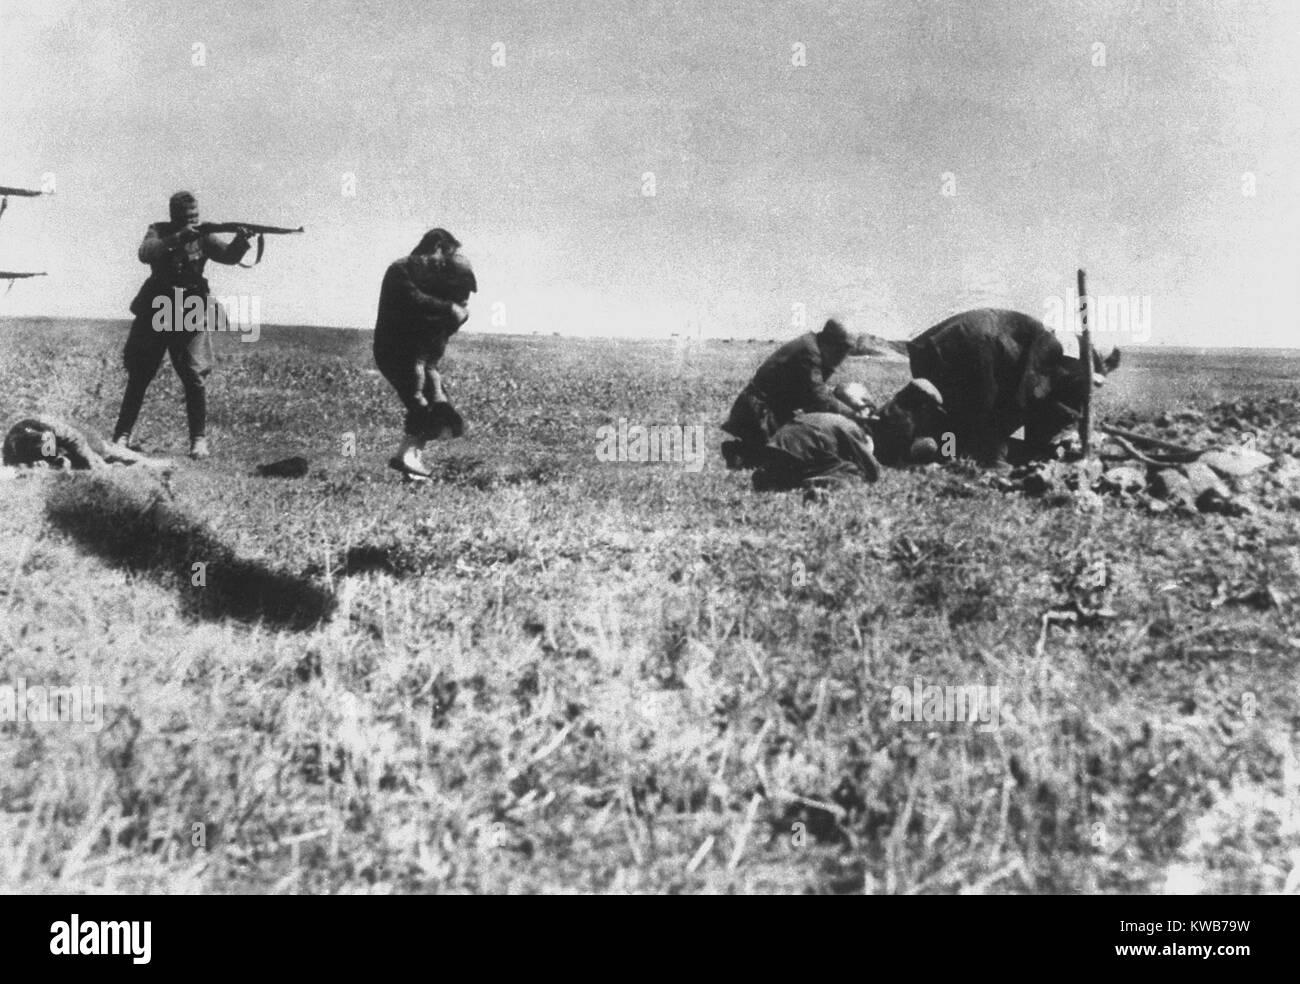 German Einsatzgruppen executing Jews of Kiev near Ivangorod, Ukraine. Photo was intercepted by a postal worker who Stock Photo